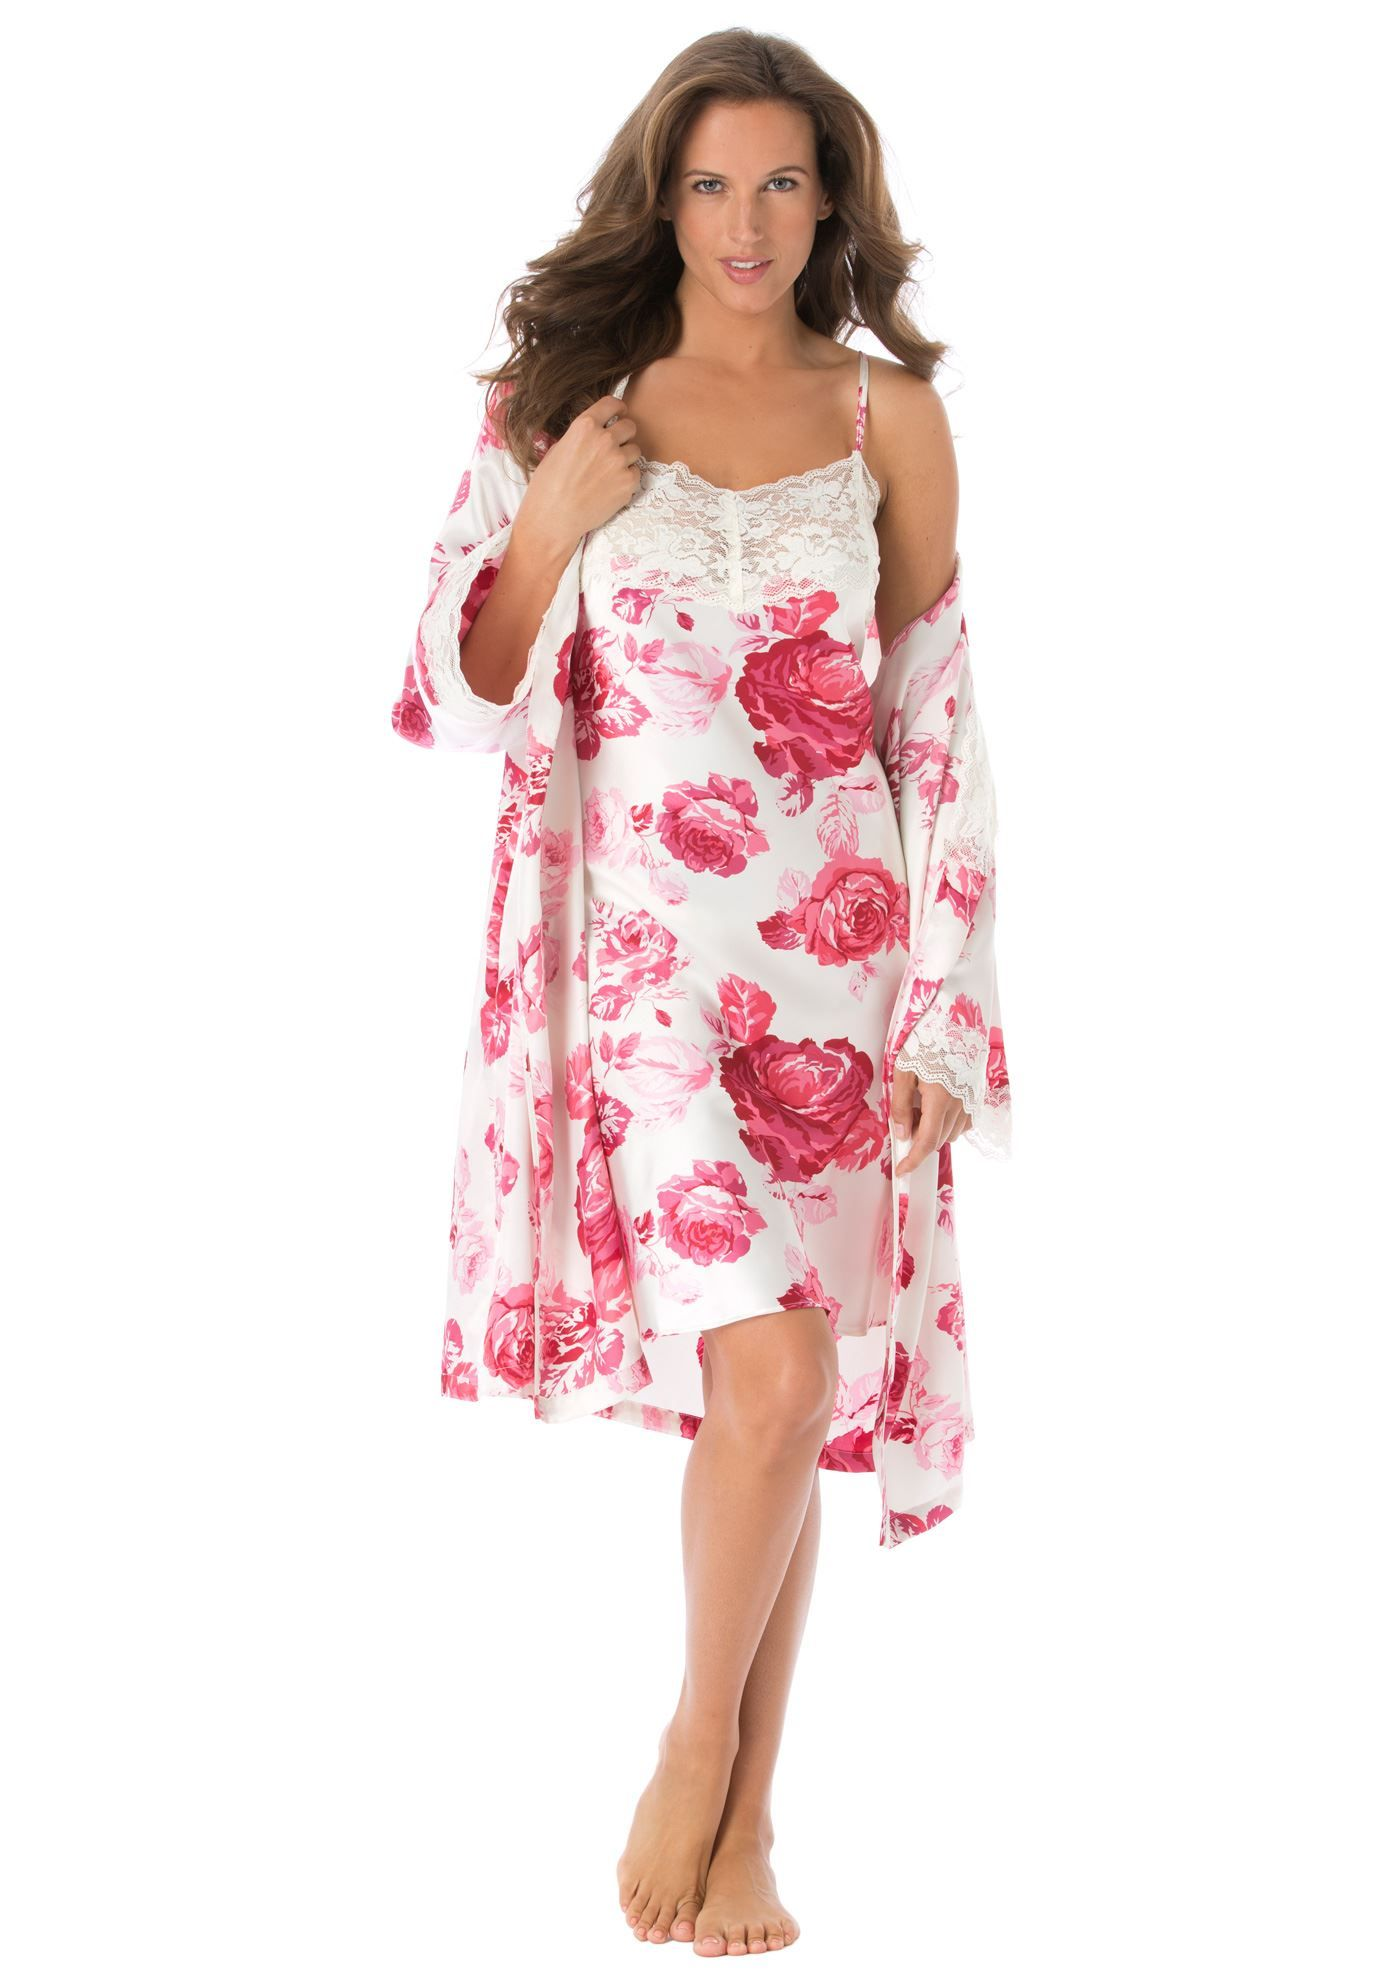 2ecb659da4349 Plus Size Nightgowns for Women. Plus Size Short satin peignoir set